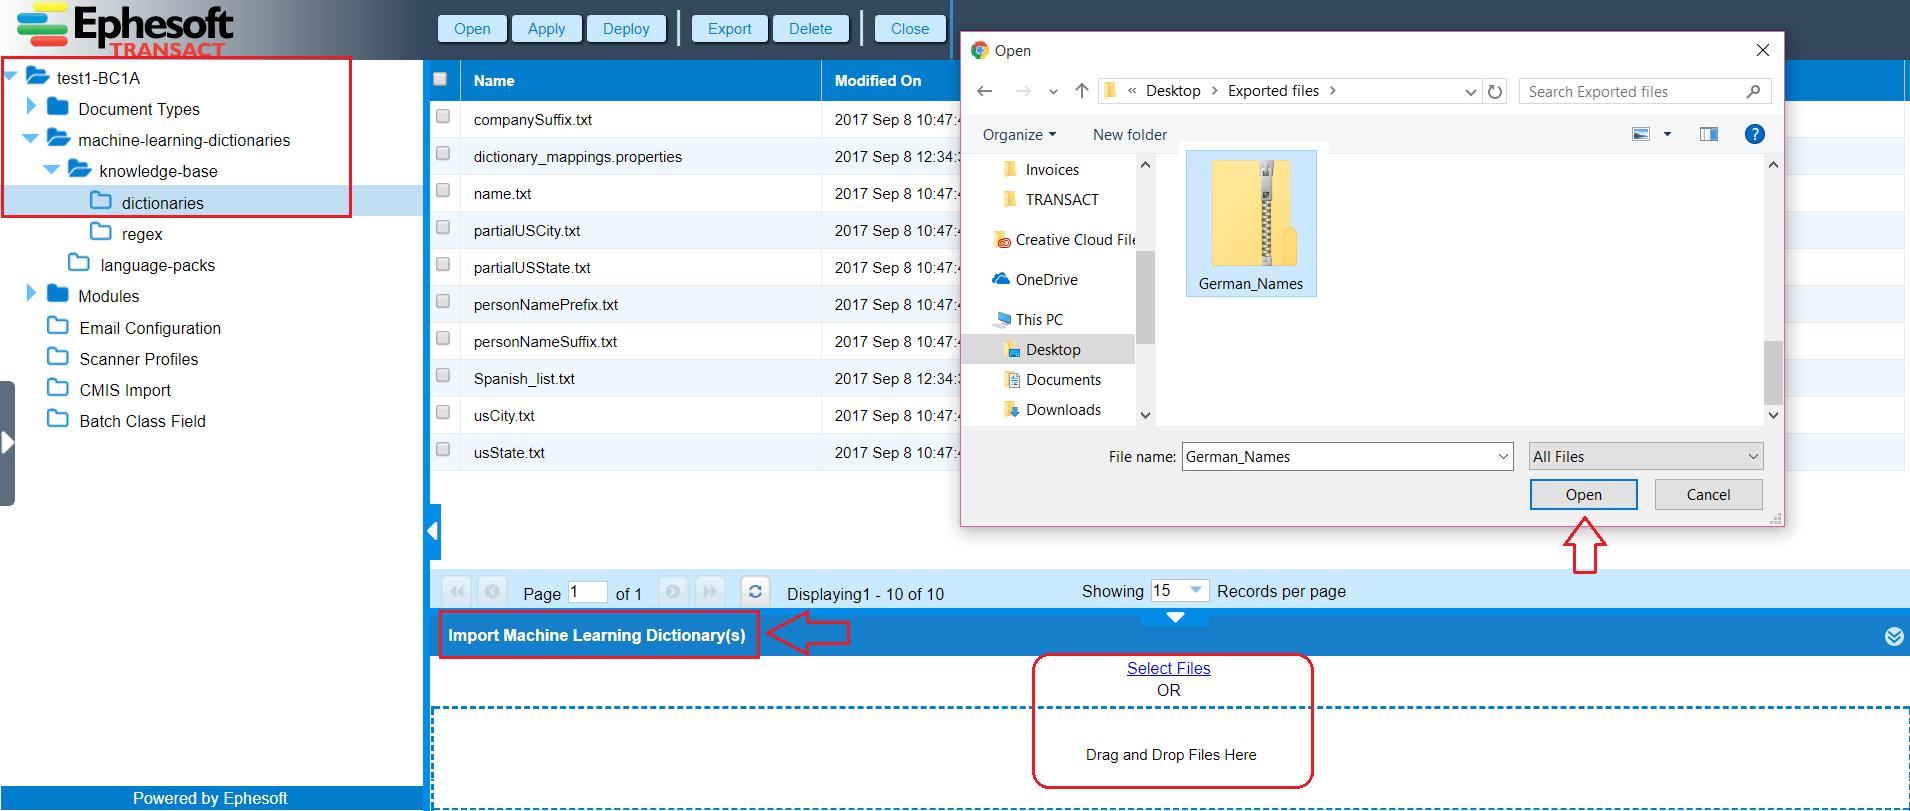 C:\Users\Ephesoft\AppData\Local\Microsoft\Windows\INetCache\Content.Word\23-1.png